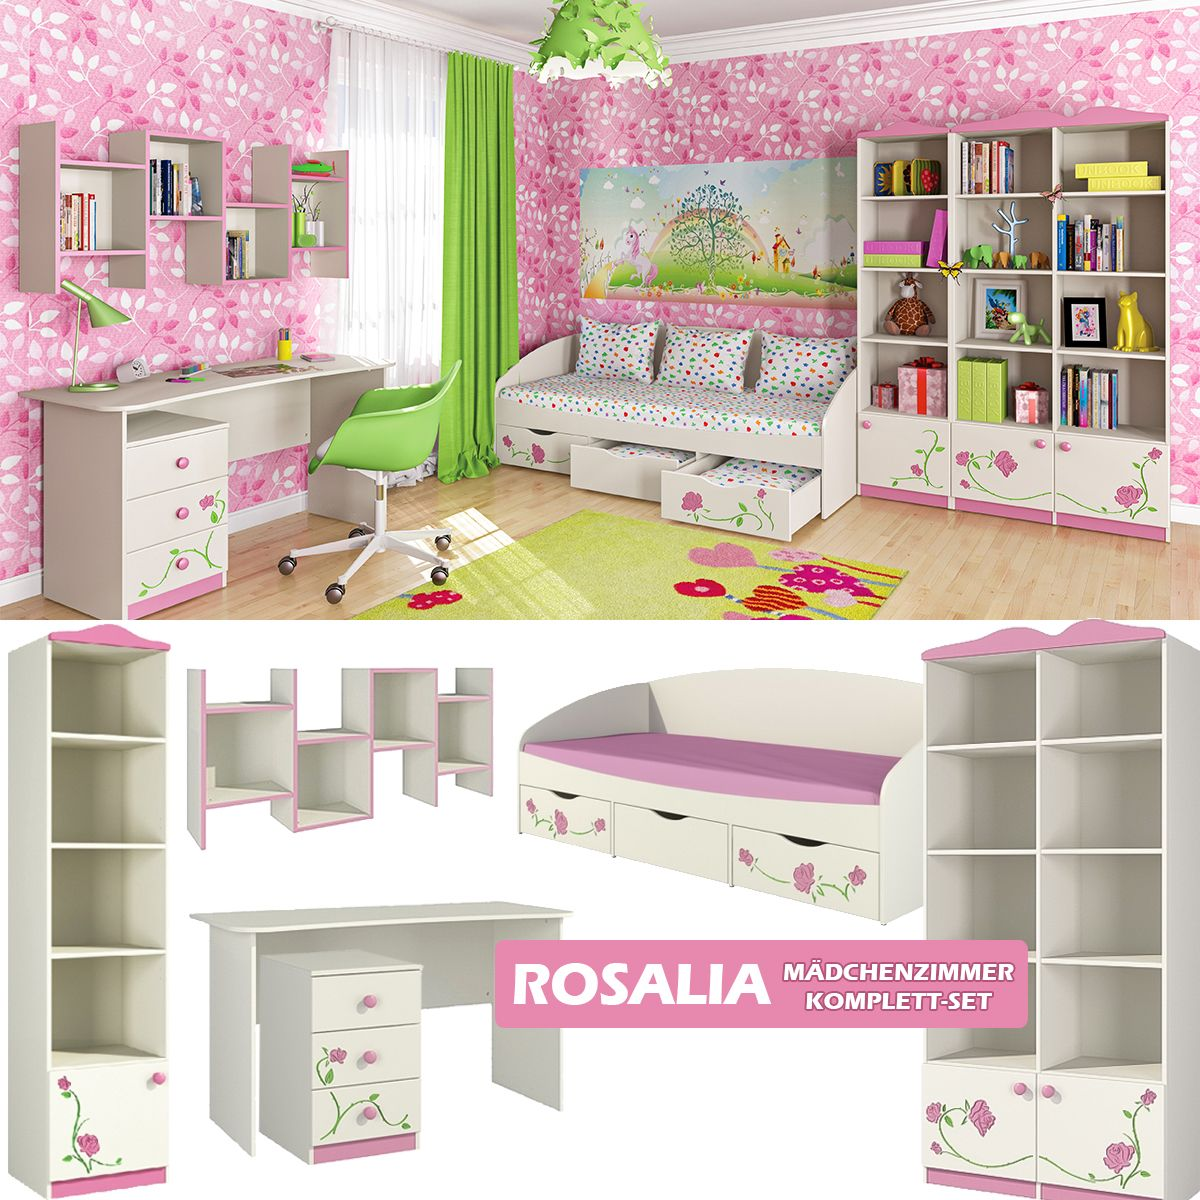 Rosalie Madchenzimmer Komplett Set Kinderzimmer Fur Madchen Cremeweiss In 2020 Kinderzimmer Fur Madchen Kinder Zimmer Kinderzimmer